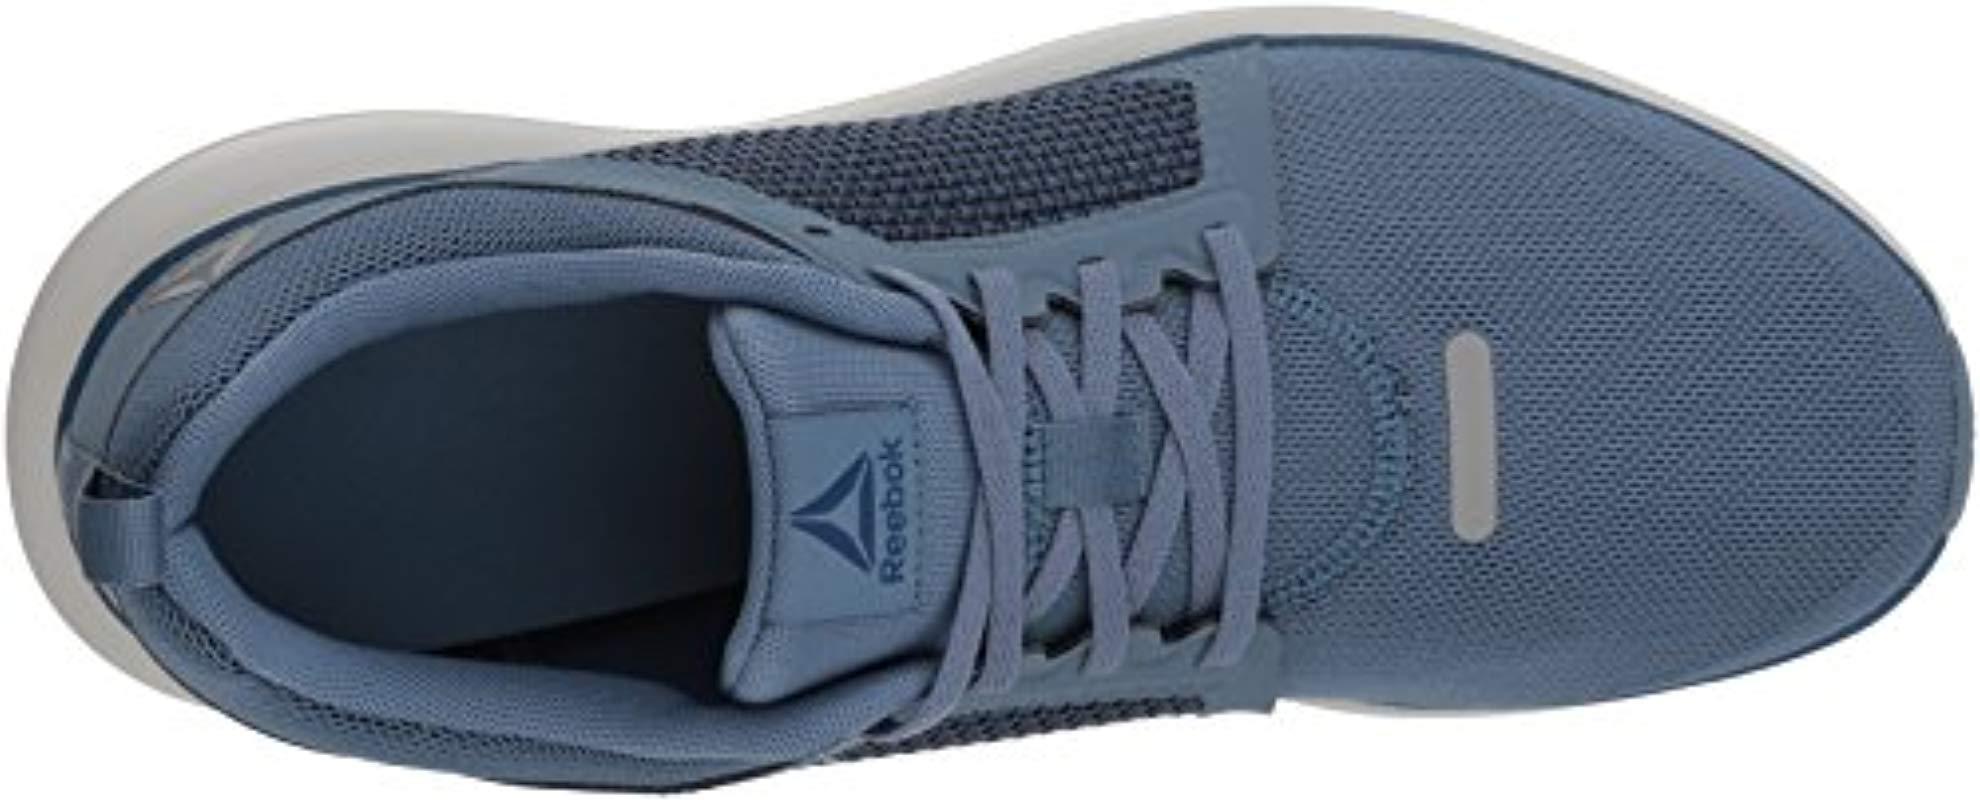 bc3b9fdcf4226d ... vast selection 359b6 fab07 Reebok - Blue Driftium Ride Running Shoe for  Men - Lyst. ...